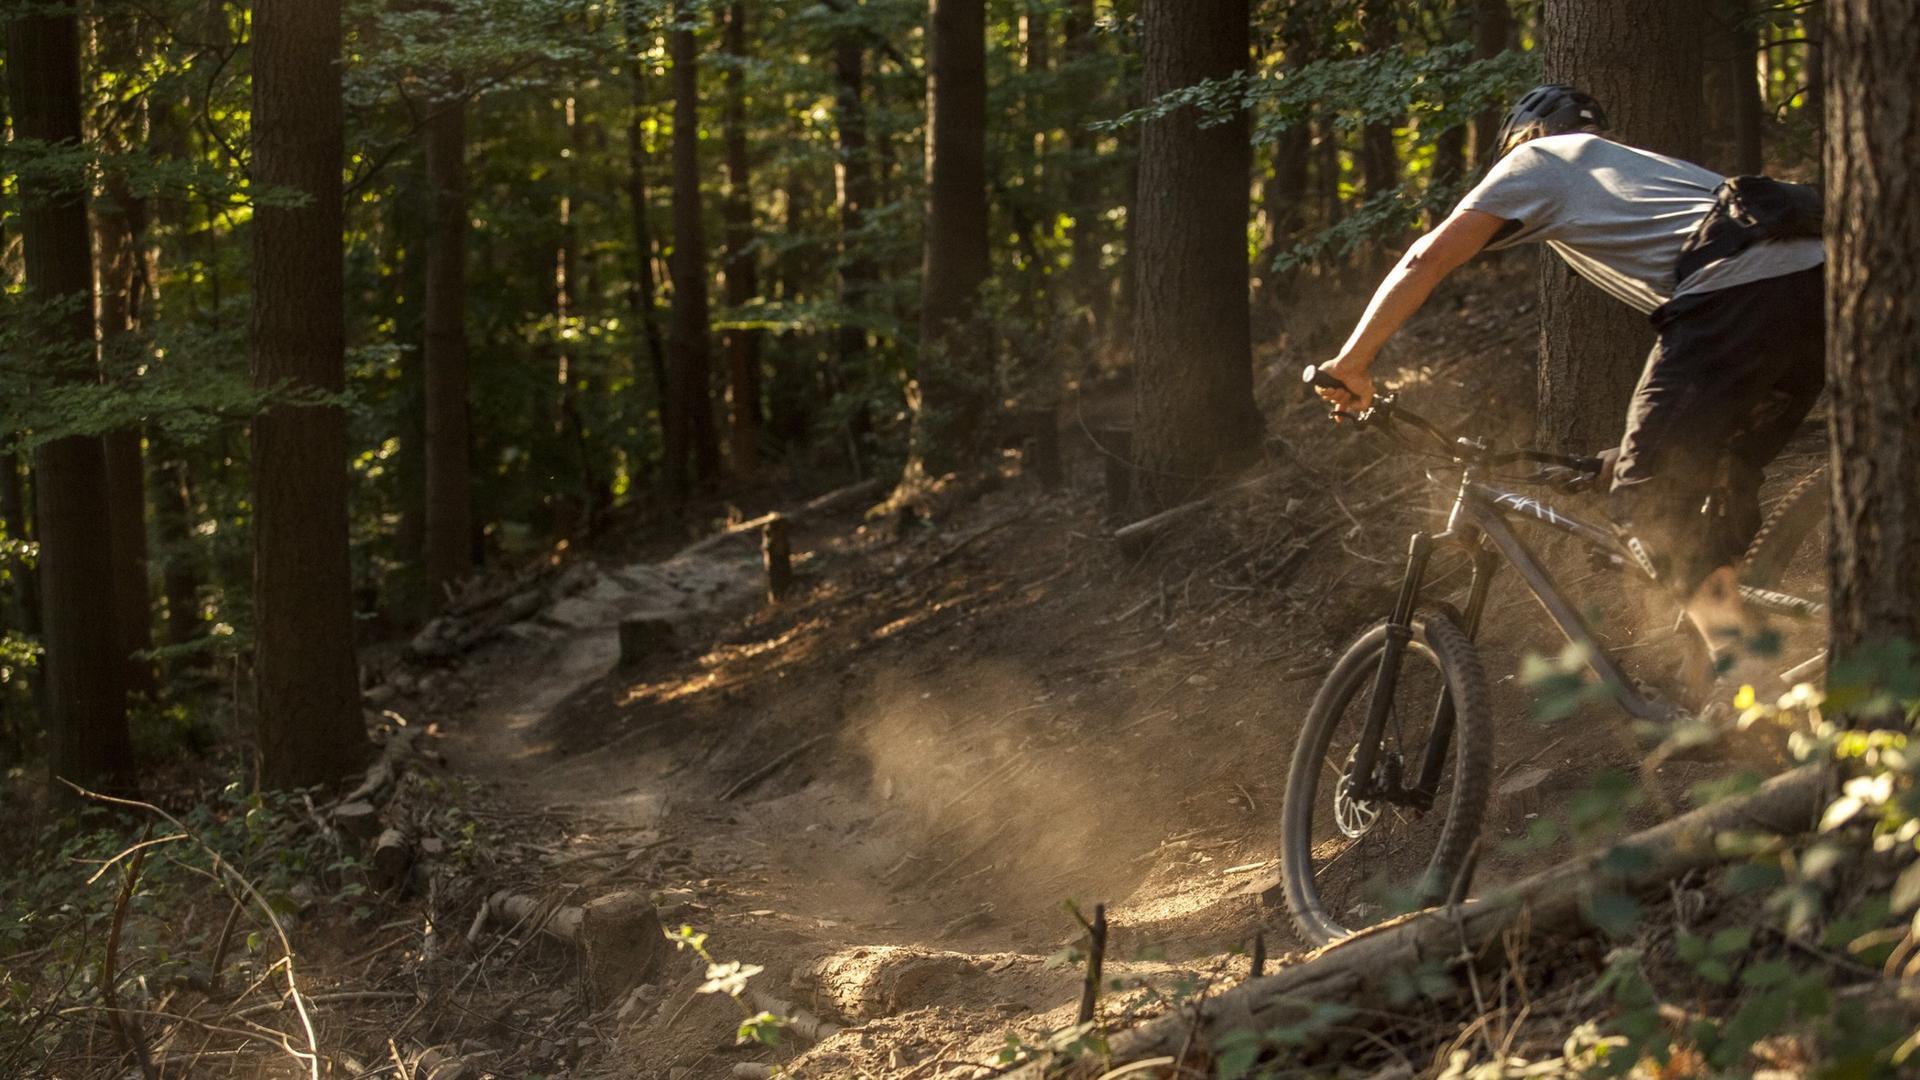 Mountainbiking im Wald